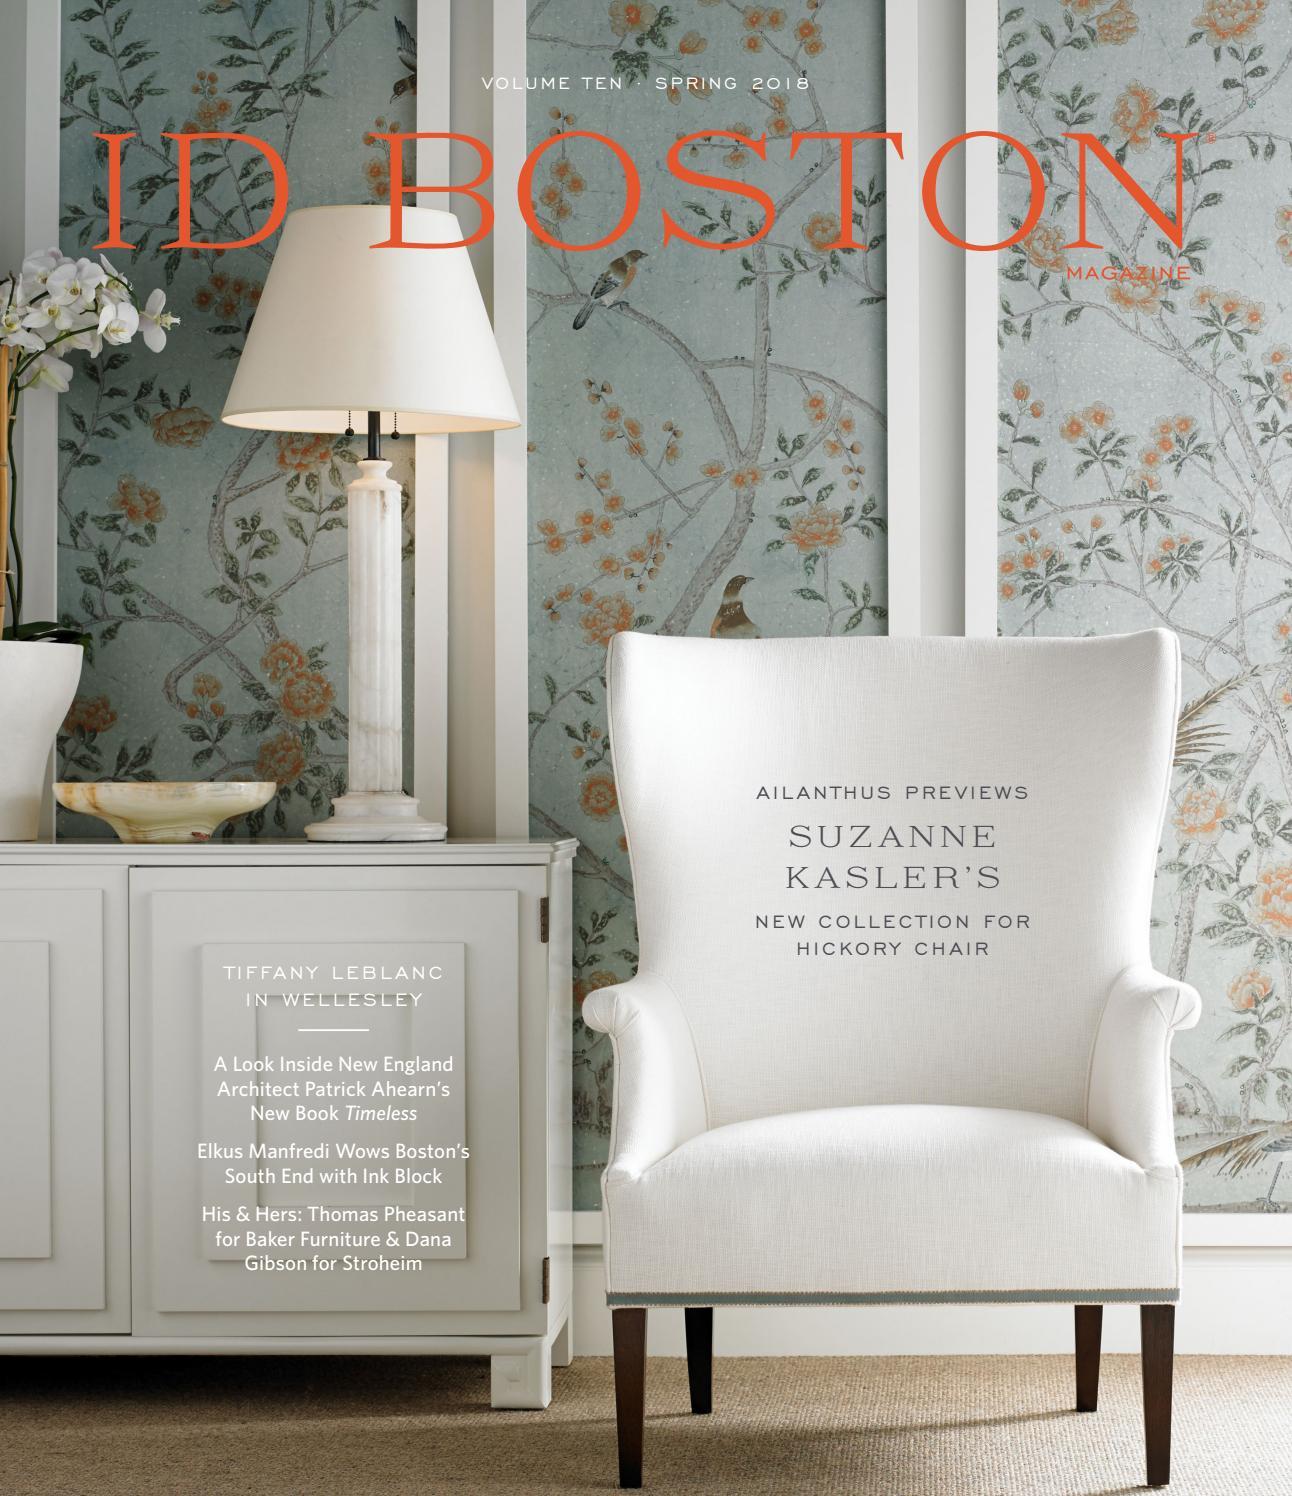 Id Boston Vol 10 By Bostondesigncenter